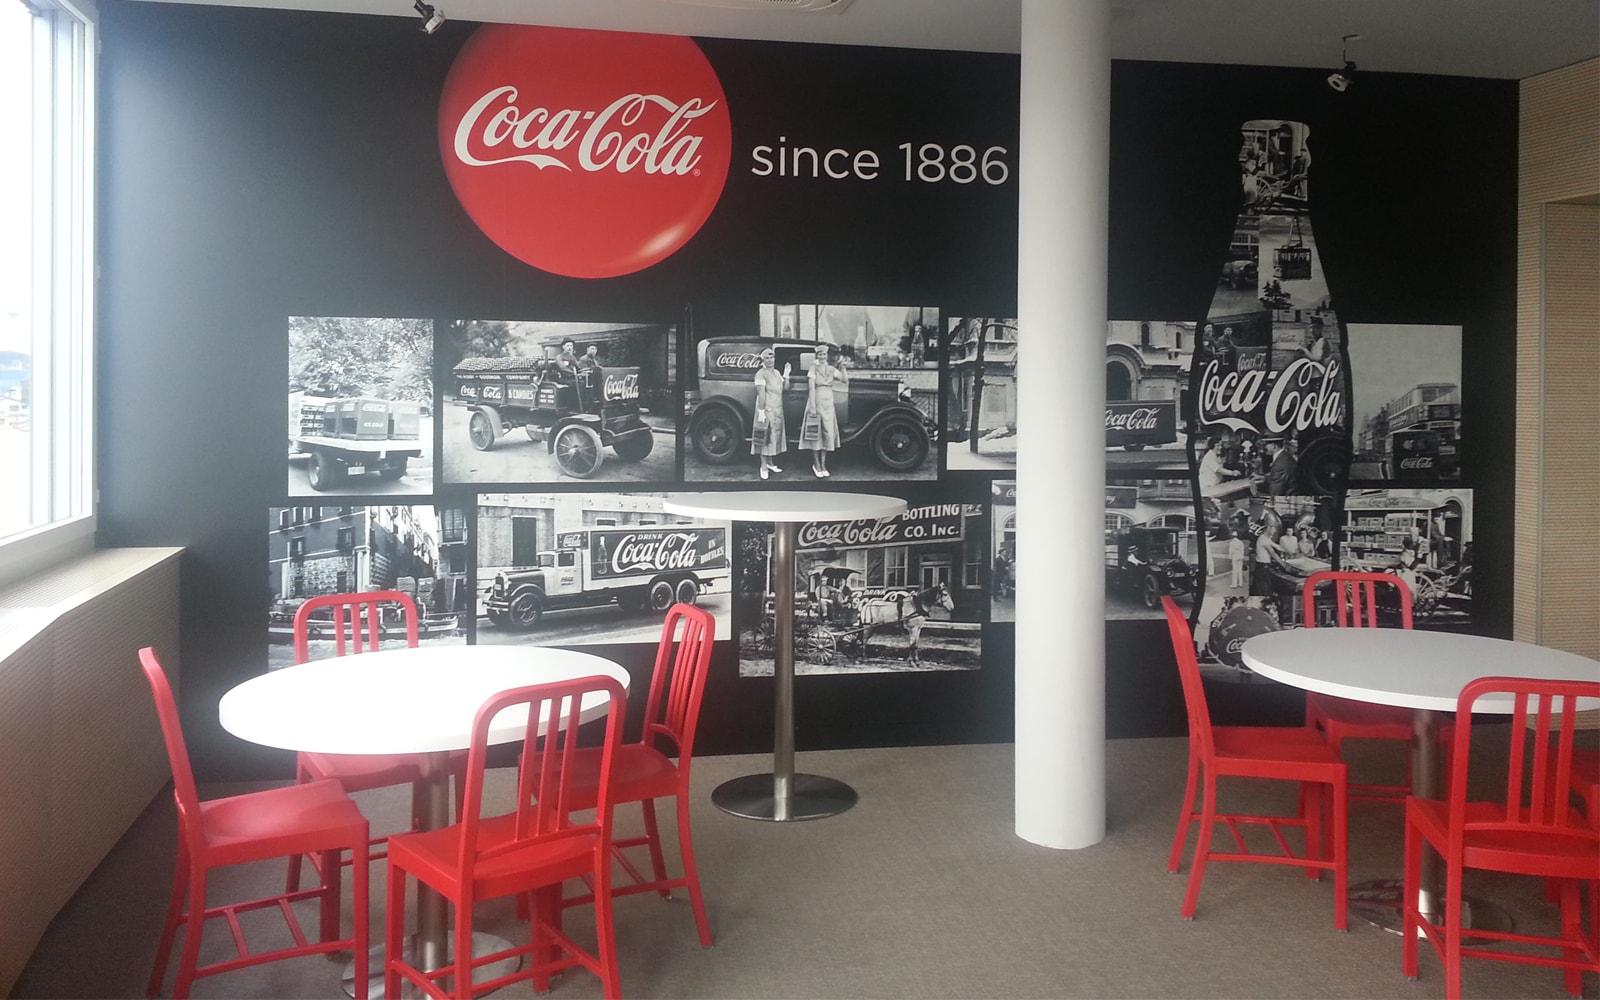 Award winning office design of Coca-Cola HBC's headquarters